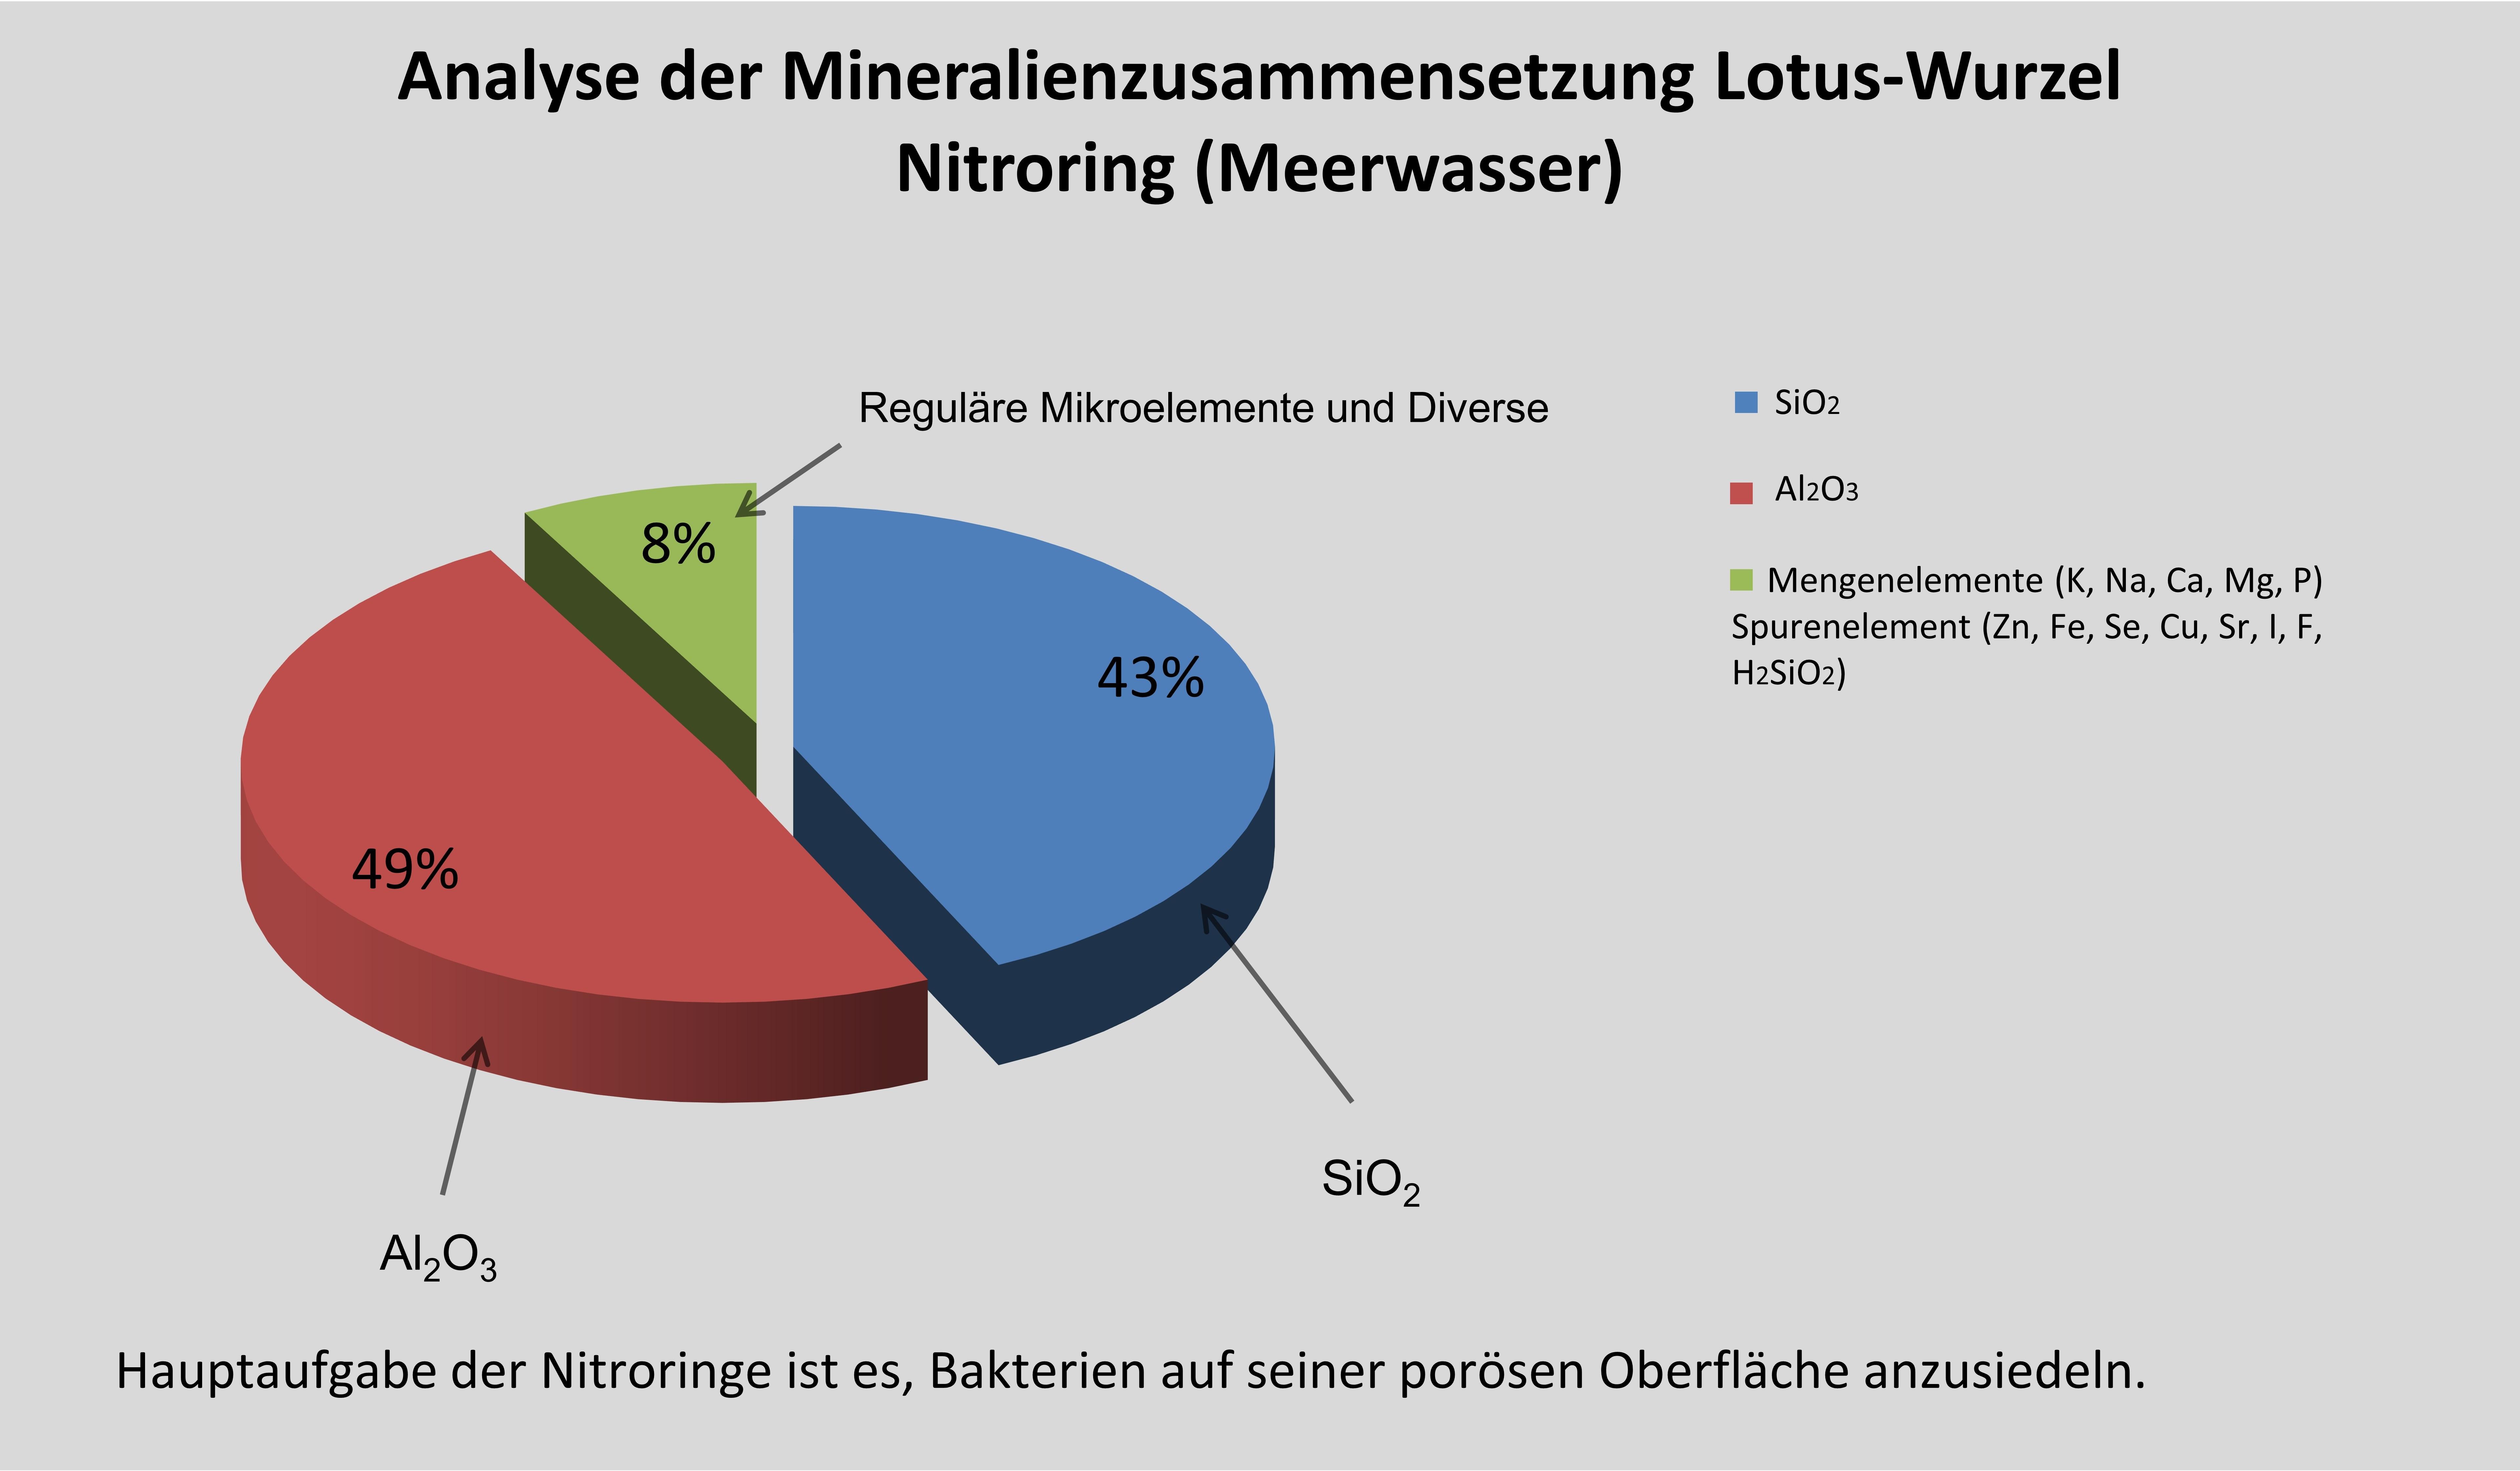 Mineralien-Lotus-Wurzel-Nitroring-MeerwasserEj18mG9EK6Ca8